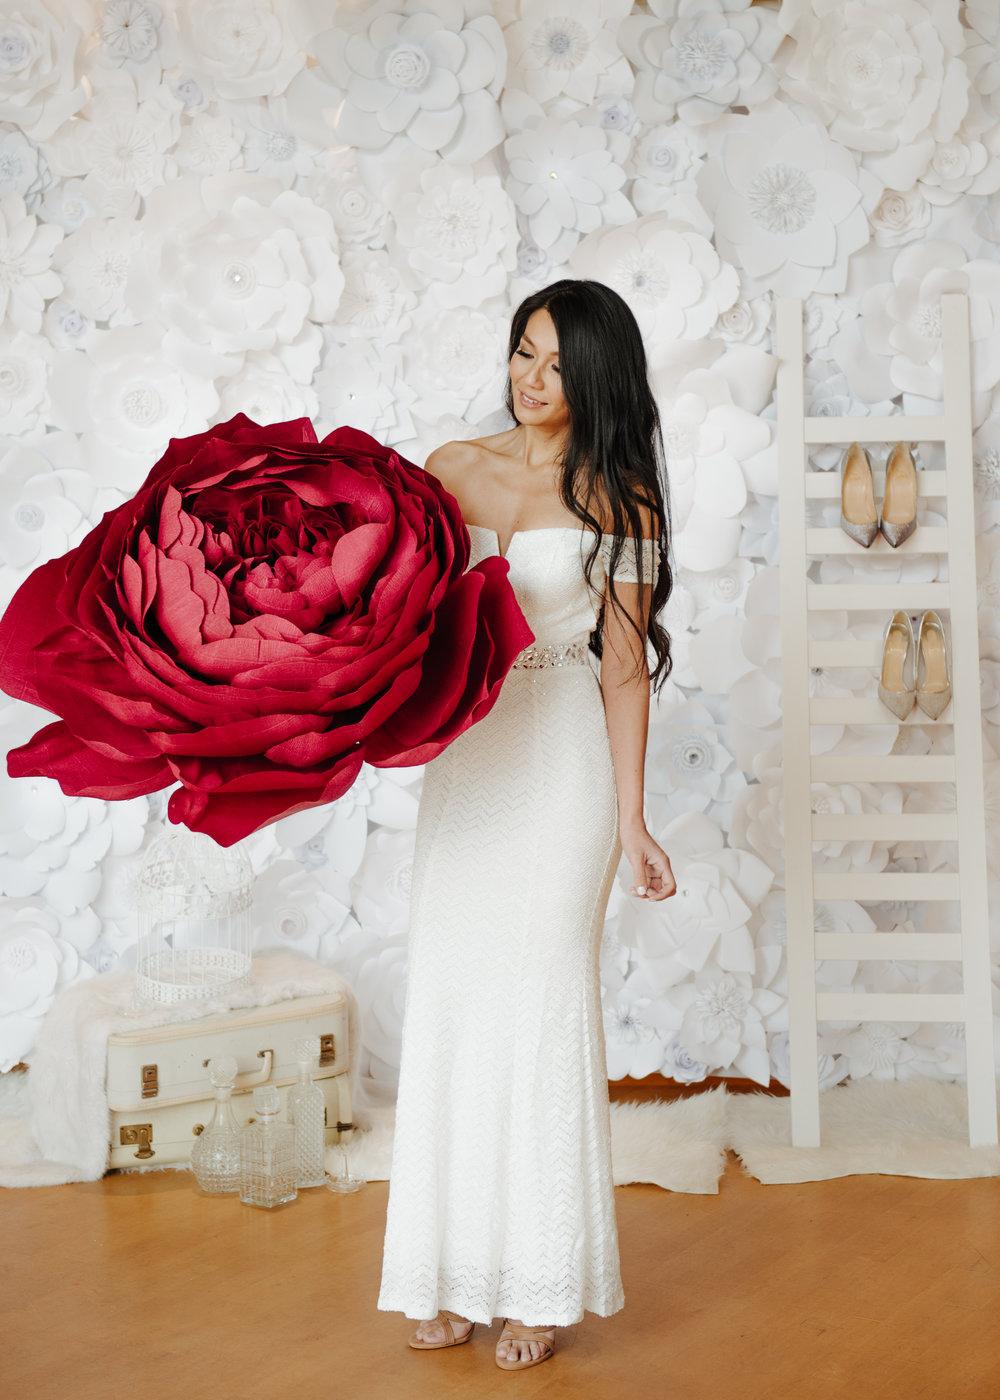 kaoverii_silva_photographer_paper_florist-4.jpg